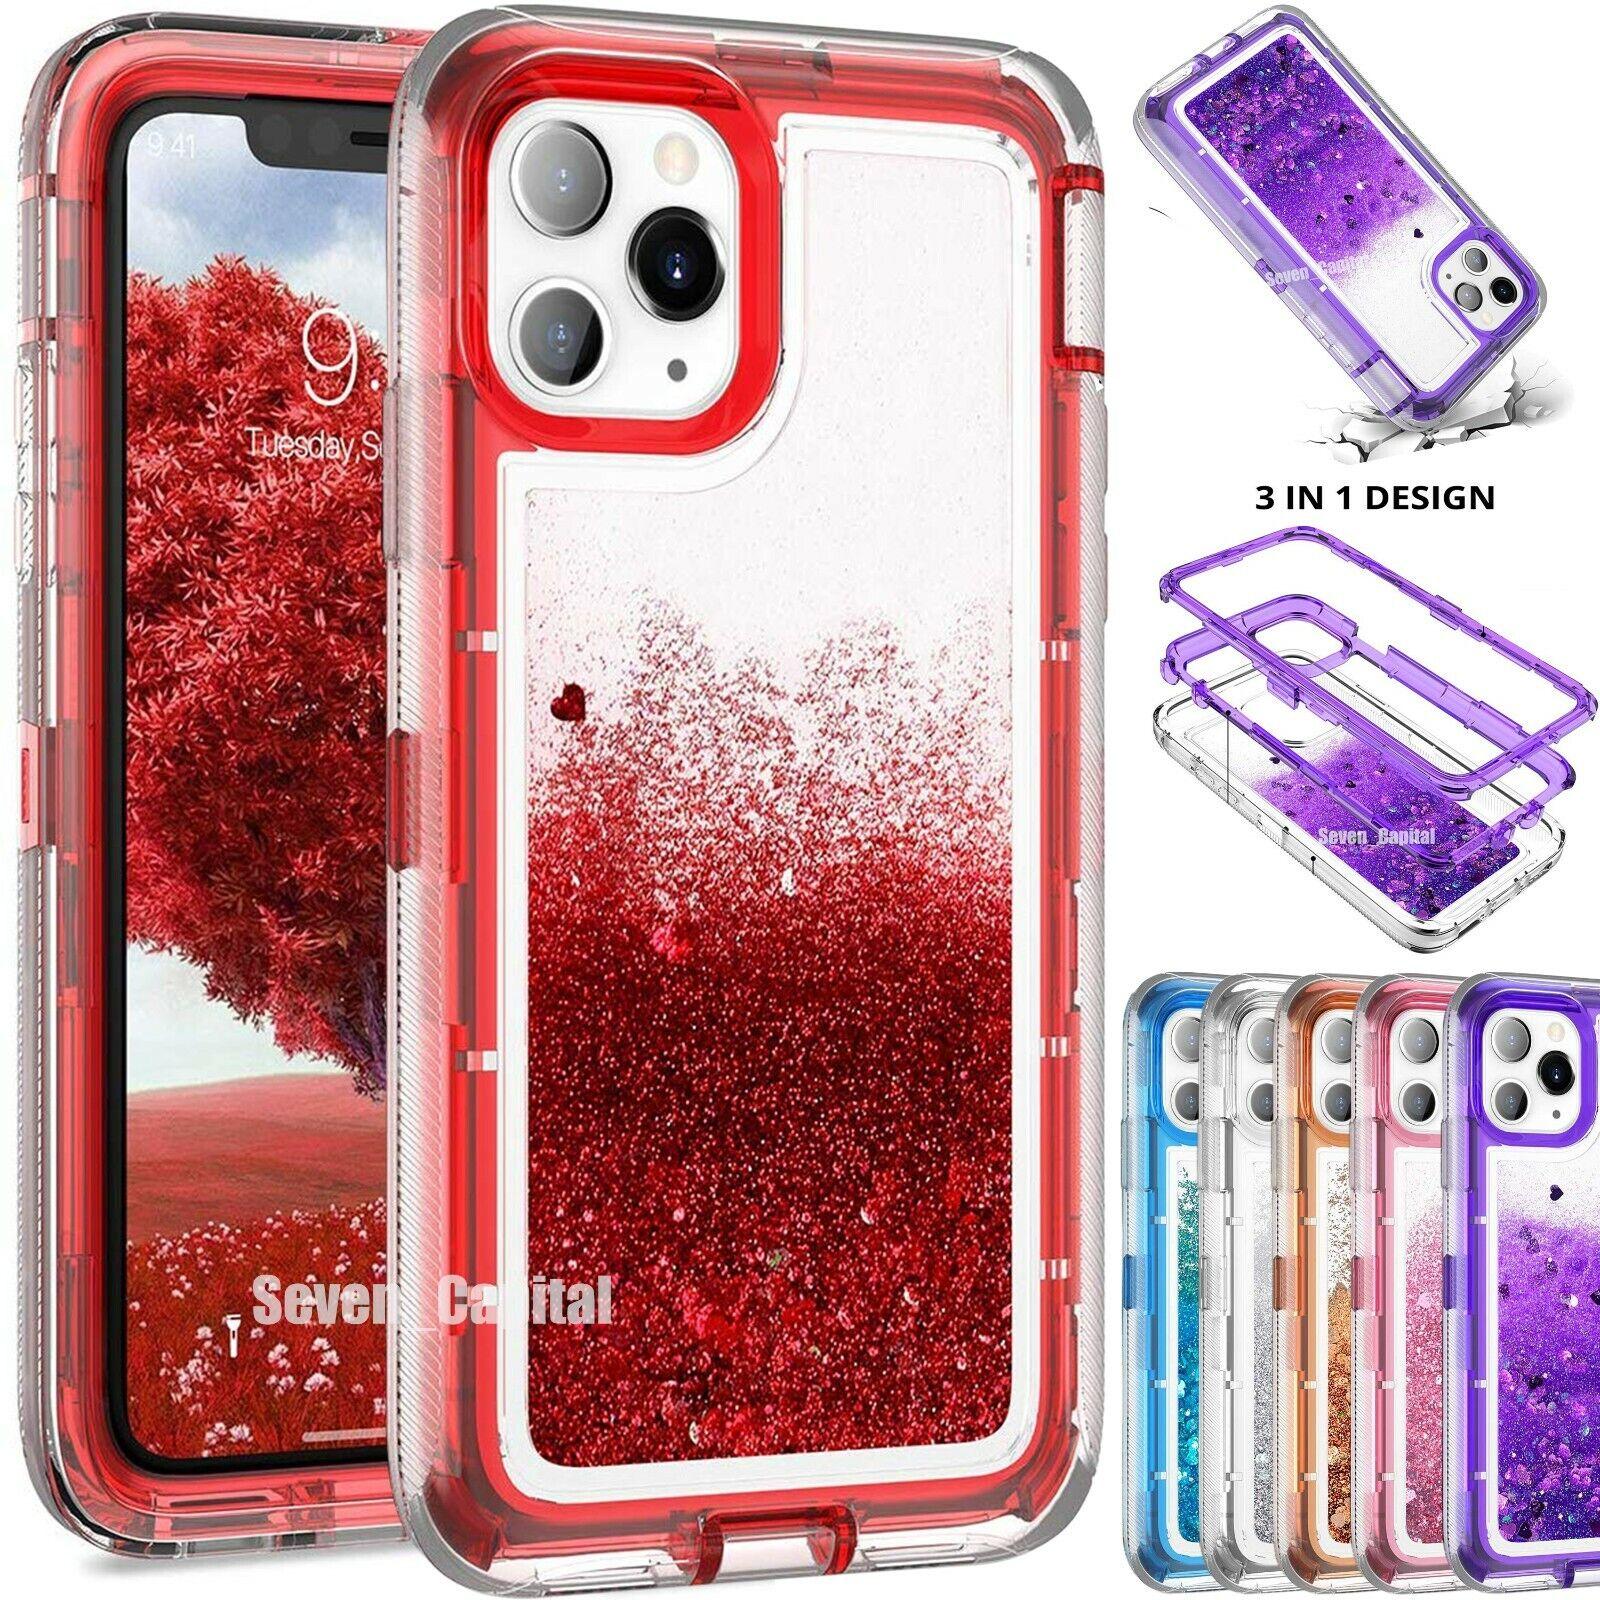 как выглядит For iPhone 11 Pro Max Defender Liquid Glitter Shockproof Case Fit Otterbox Clip фото